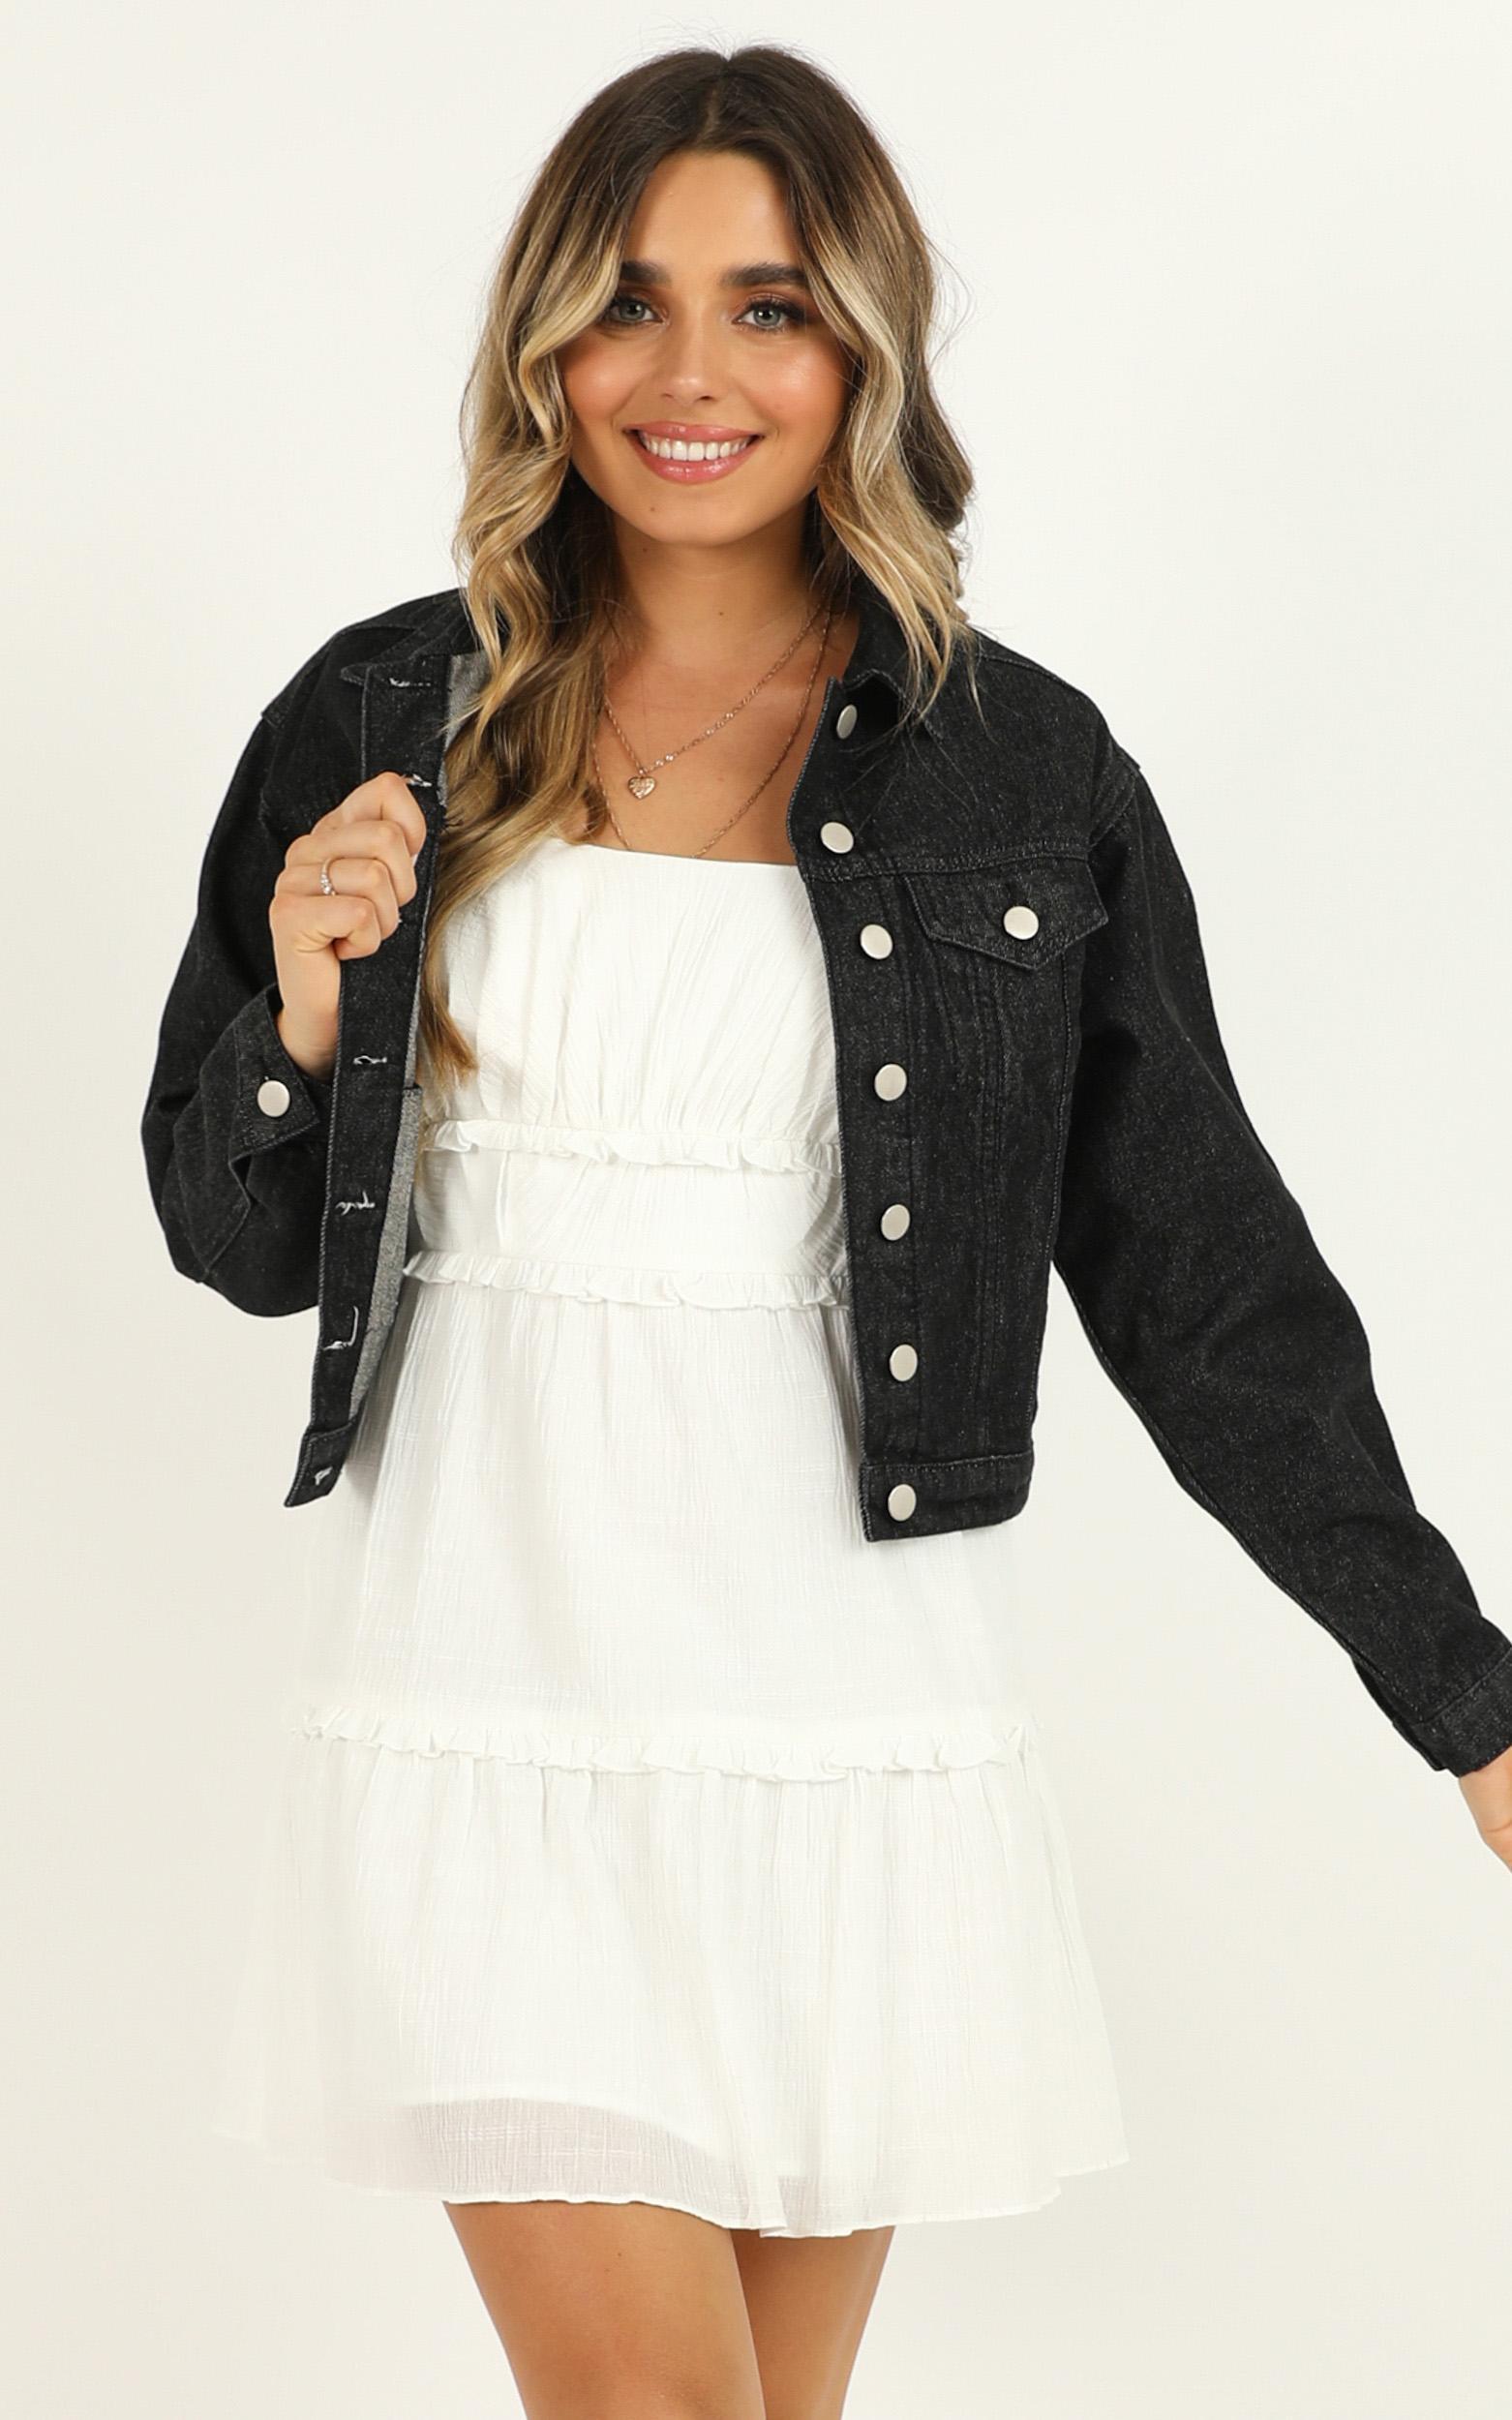 One For The Girls denim jacket In washed black - 18 (XXXL), Black, hi-res image number null